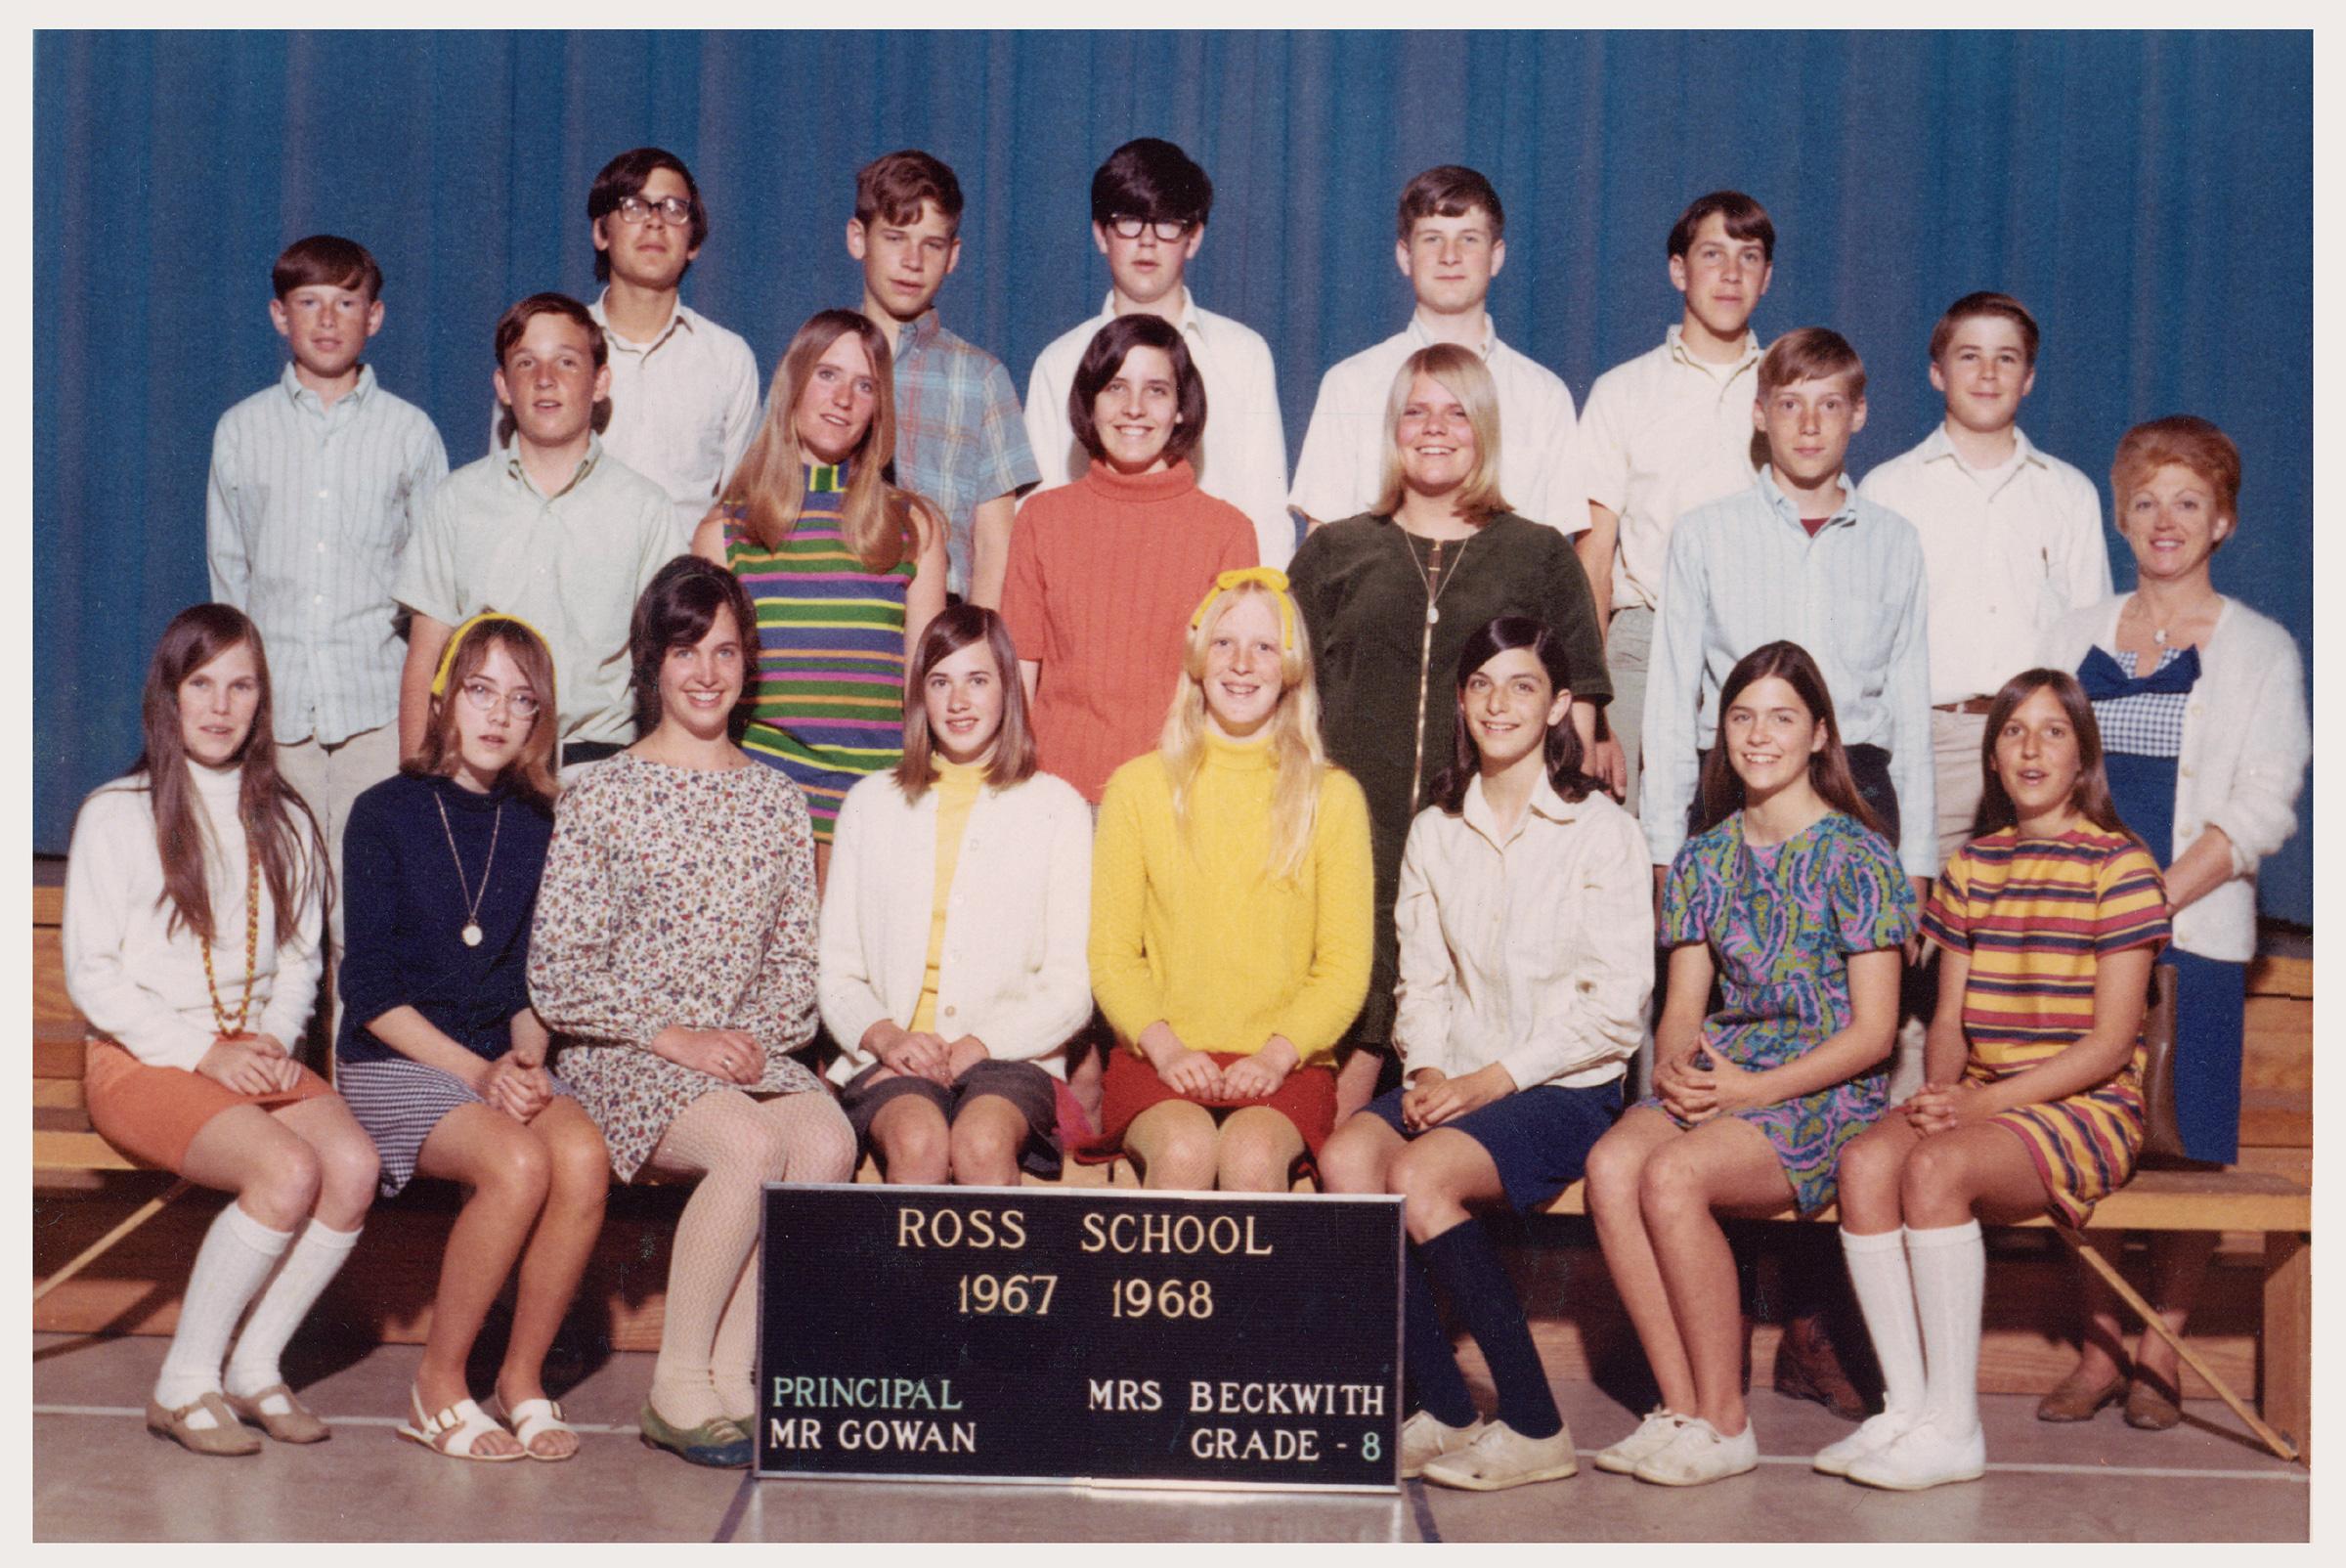 Ross School 8th Grade Class Picture (19671968), Mrs